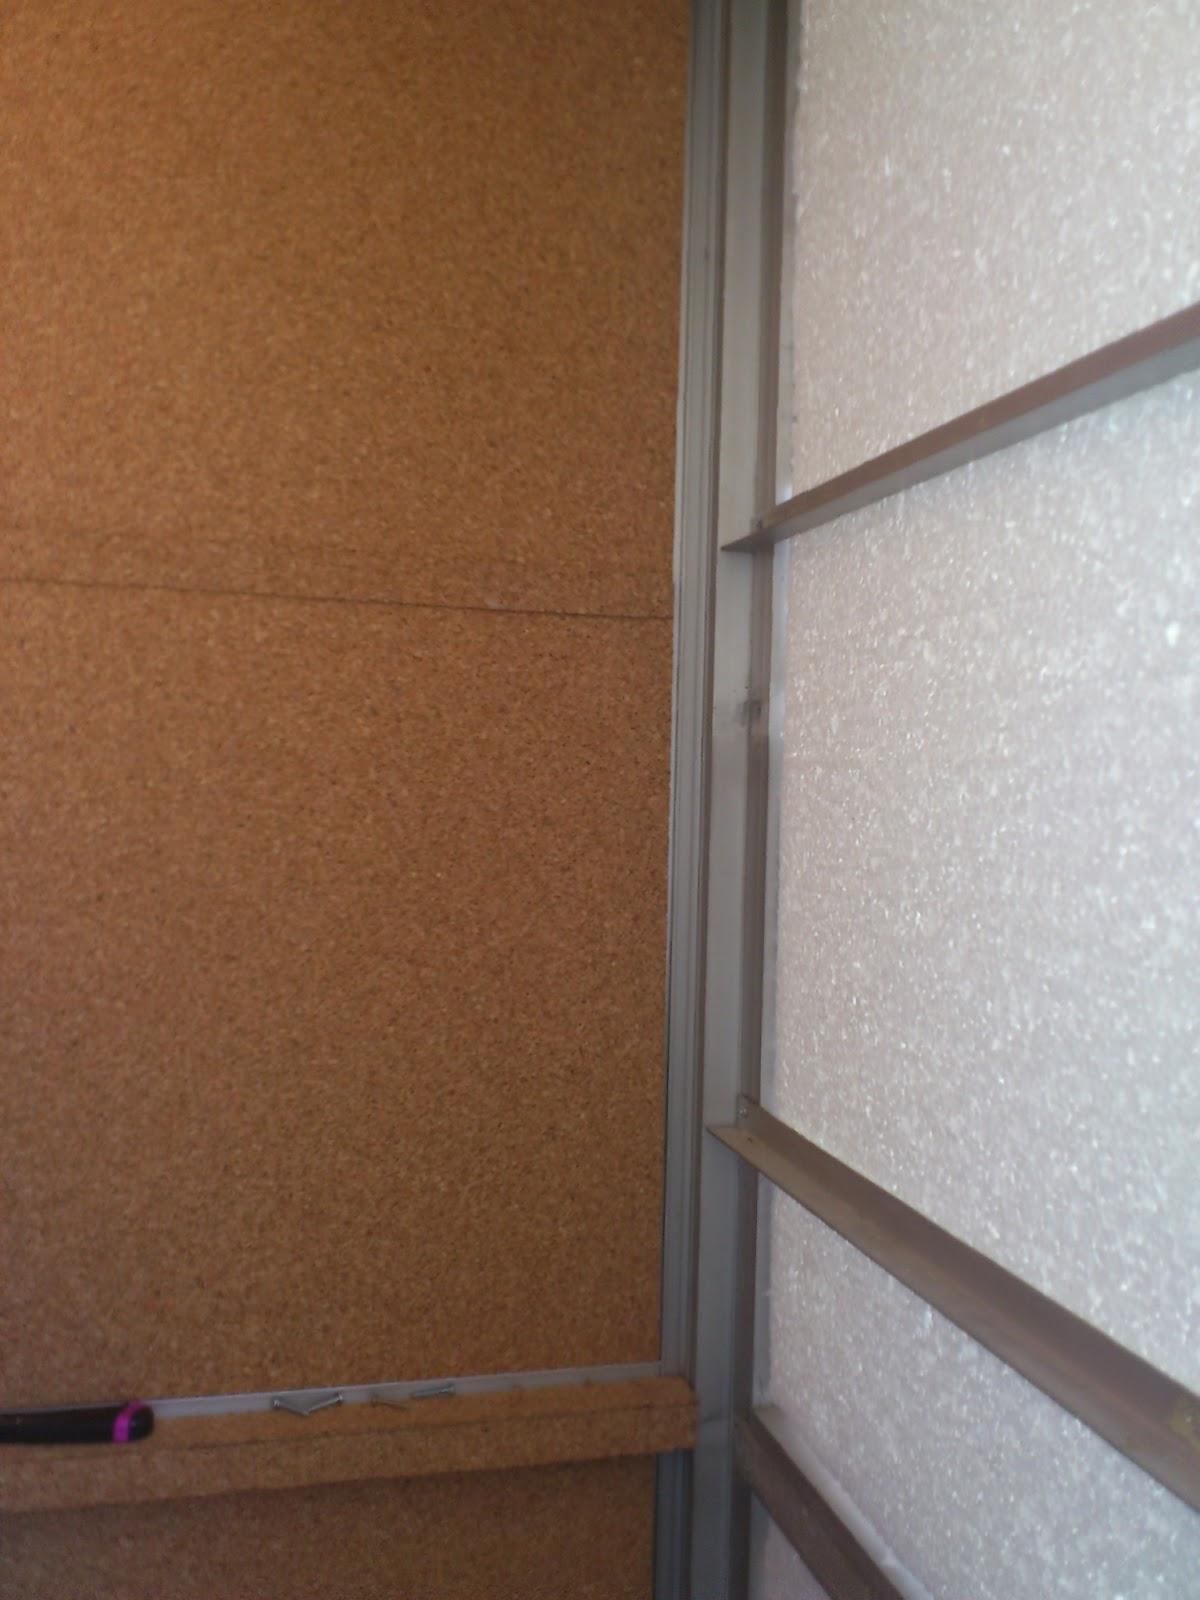 Corcho para aislar del frio transportes de paneles de madera - Aislar paredes termicamente ...